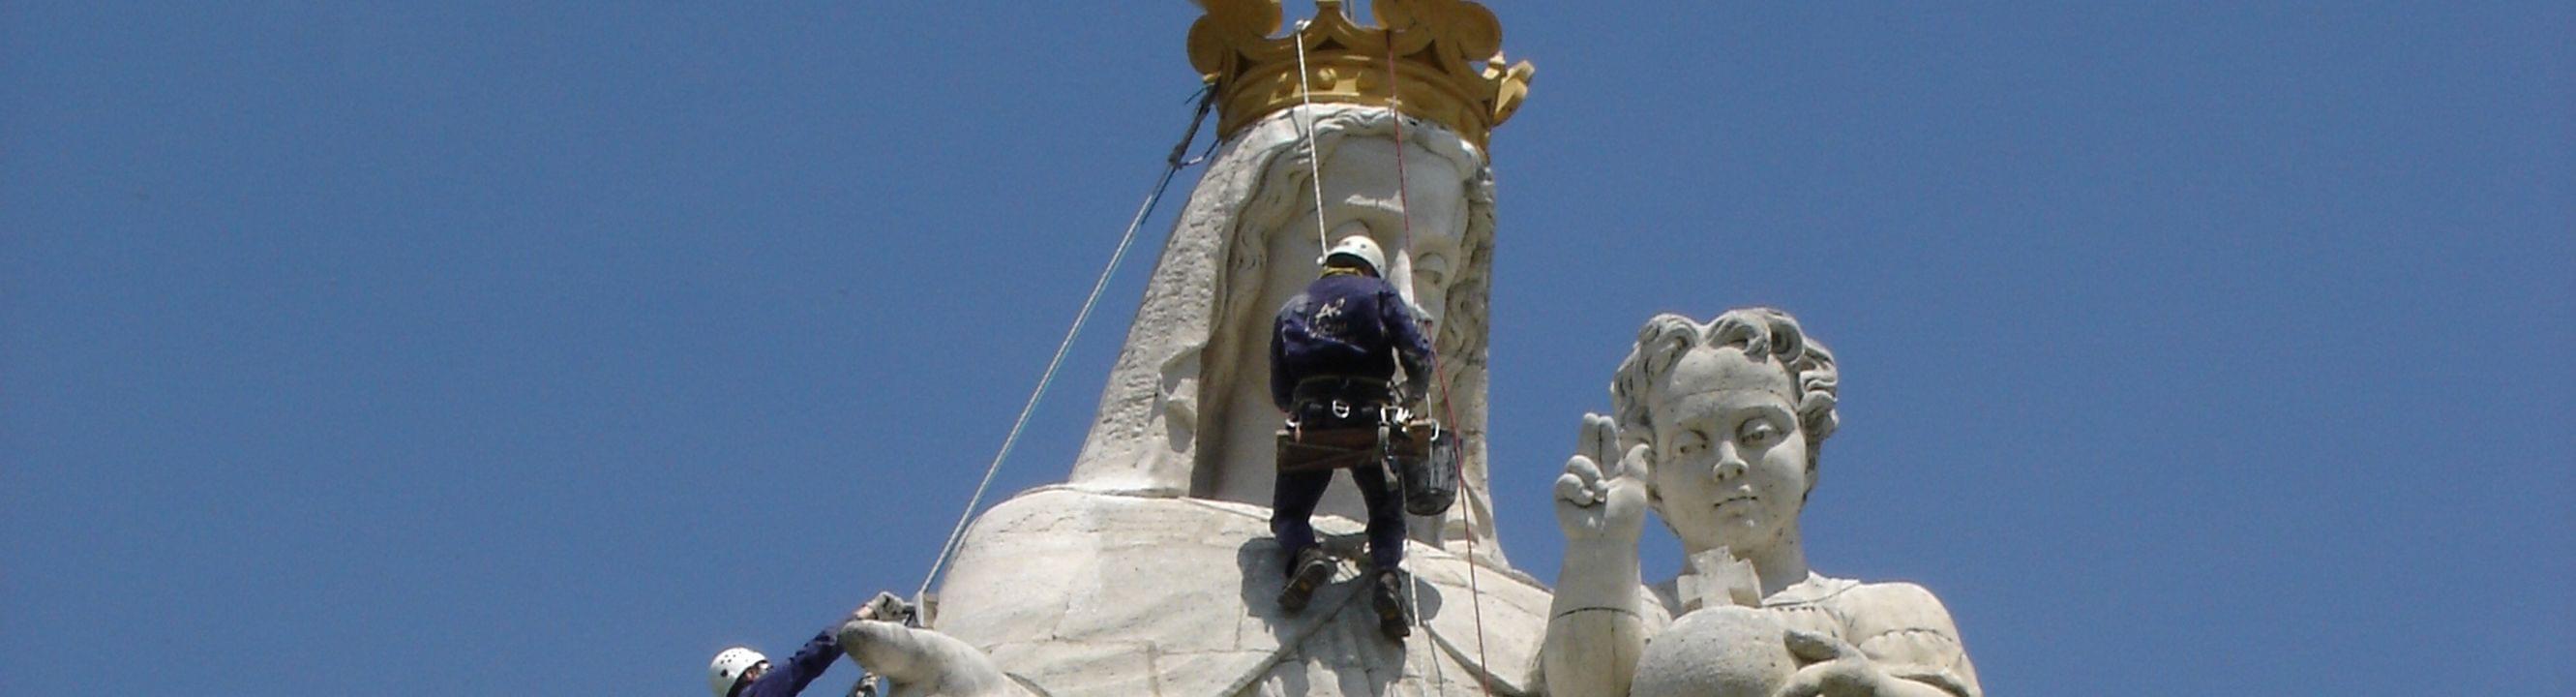 technicien cordiste urbain 06 nice cannes paca alpes maritimes  acts mission interim